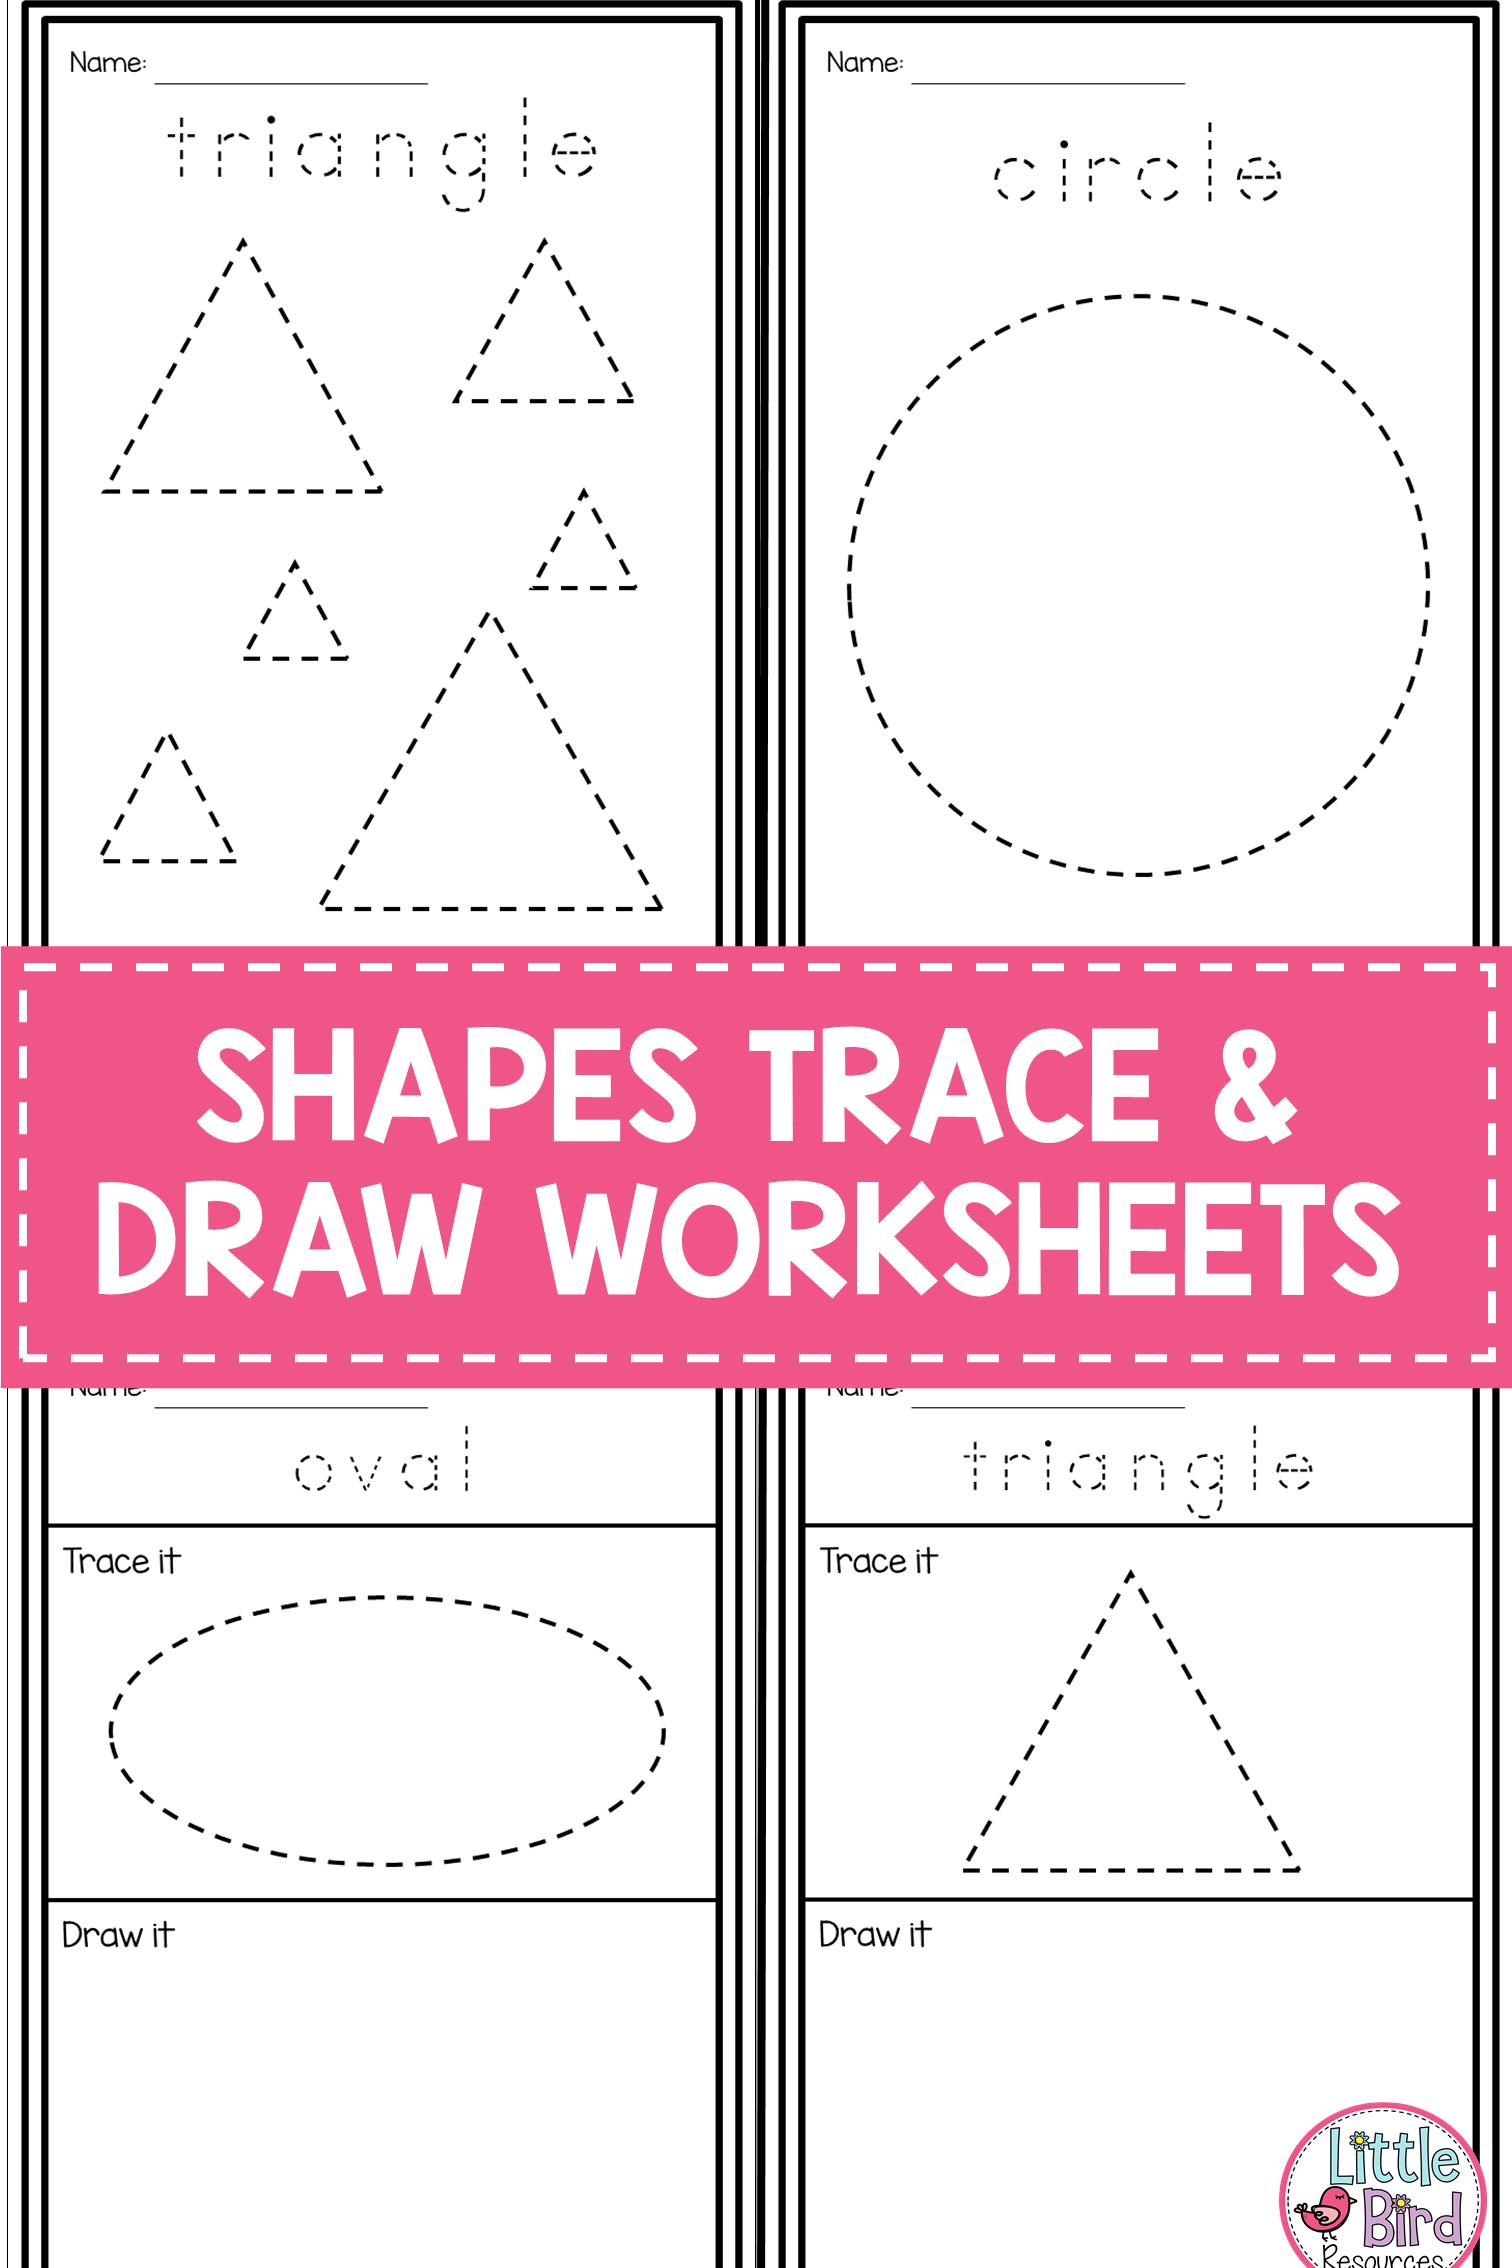 2d Shapes Worksheets Tracing Shapes Drawing Shapes 18 Shapes 54 Worksheets Shape Tracing Worksheets Shapes Worksheets Tracing Shapes [ 2268 x 1512 Pixel ]